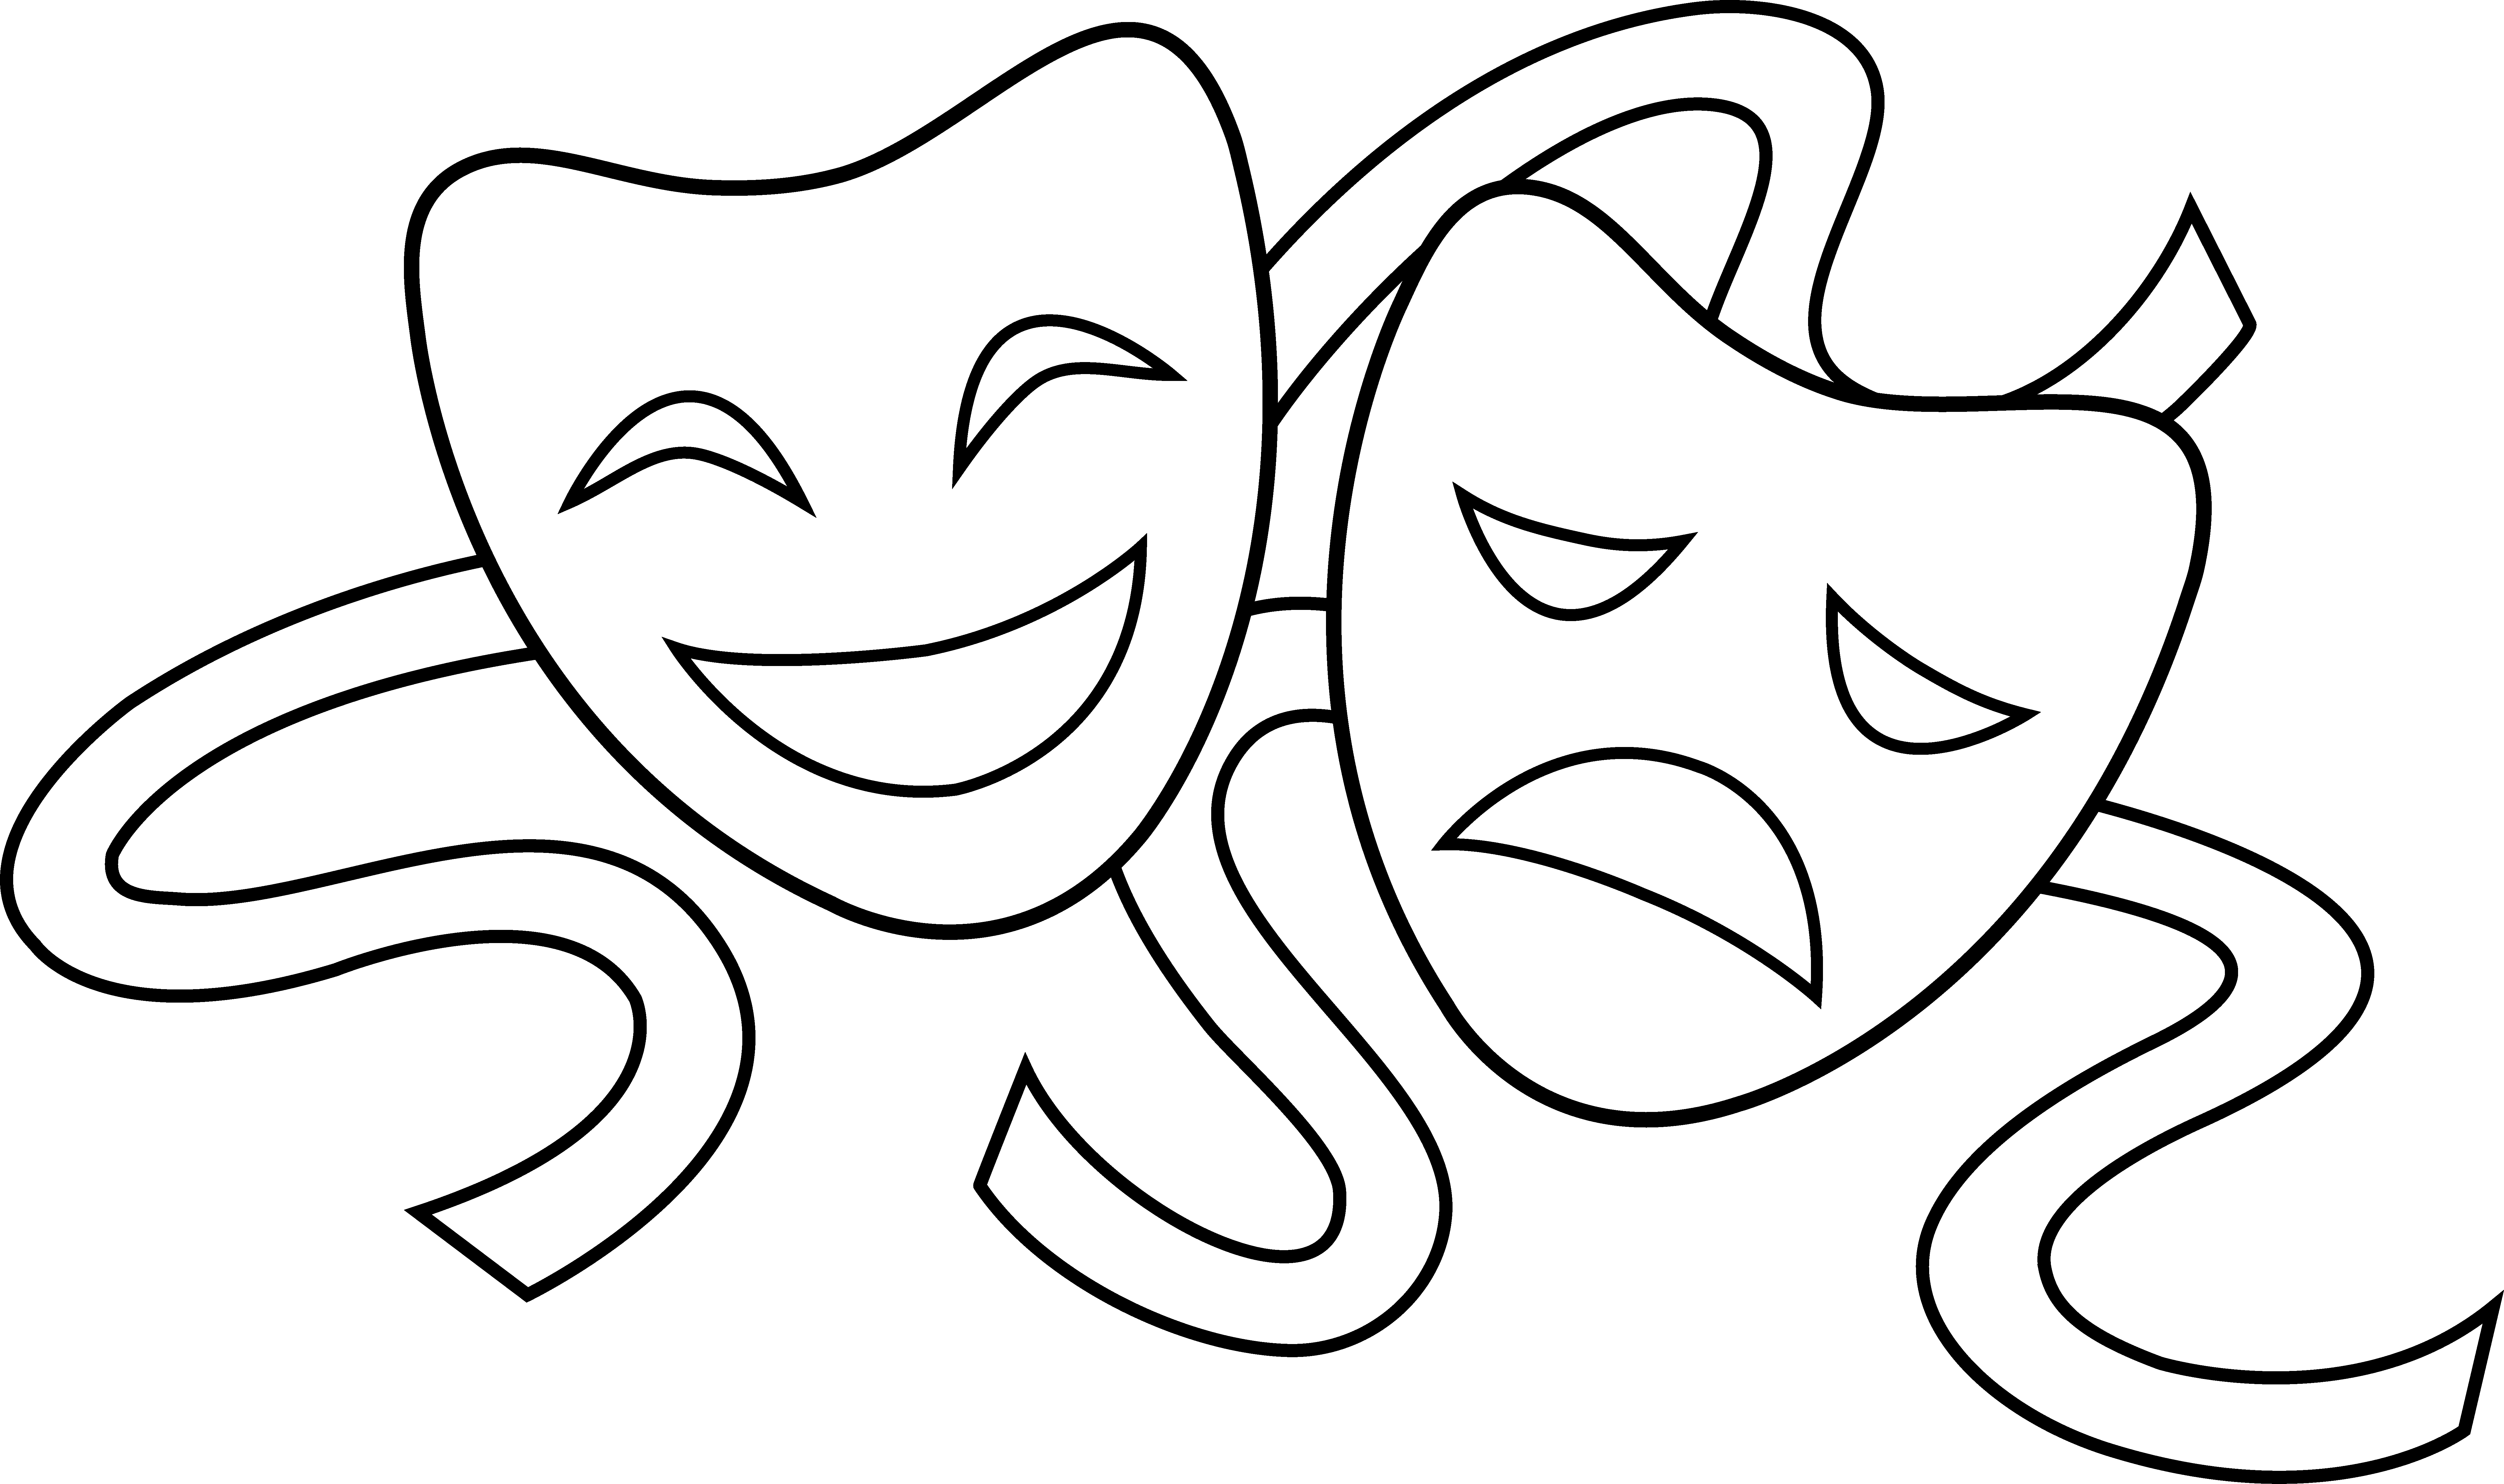 Drama masks clip art - Clipar - Drama Masks Clipart